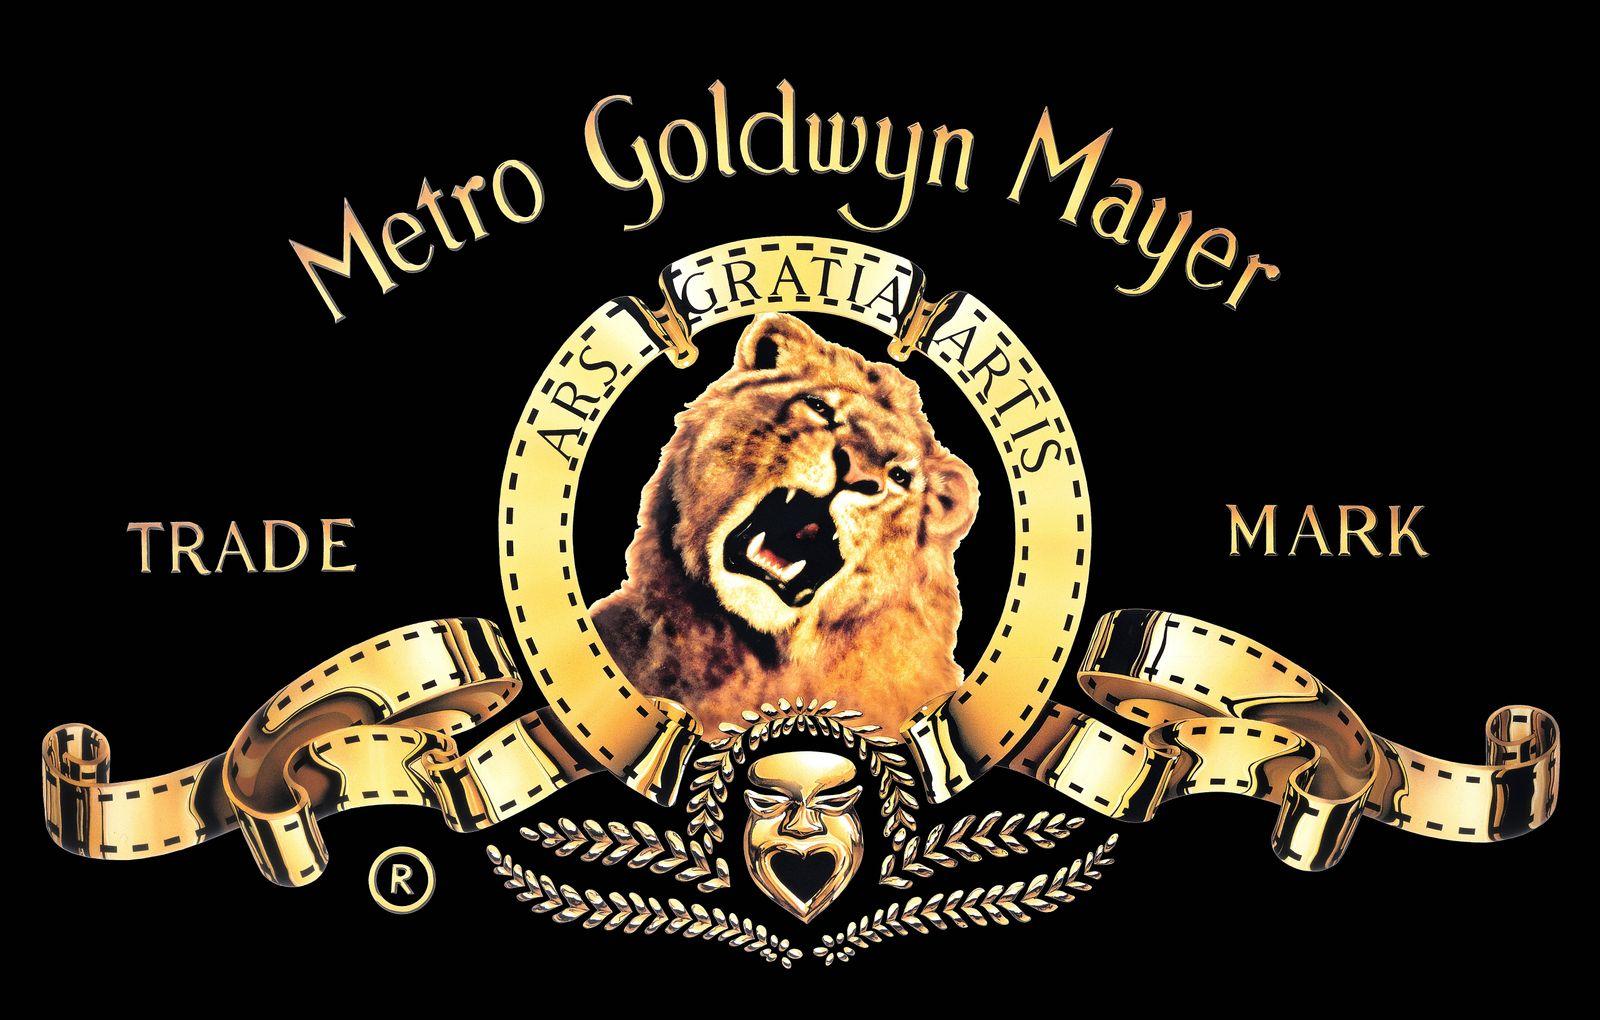 Metro Goldwyn Mayer Logo Film: Metro Goldwyn Mayer Logo (1992) 01 May 1990 28481.001 HR PUBLICATIONxINxGERxSUIxAUTxONLY